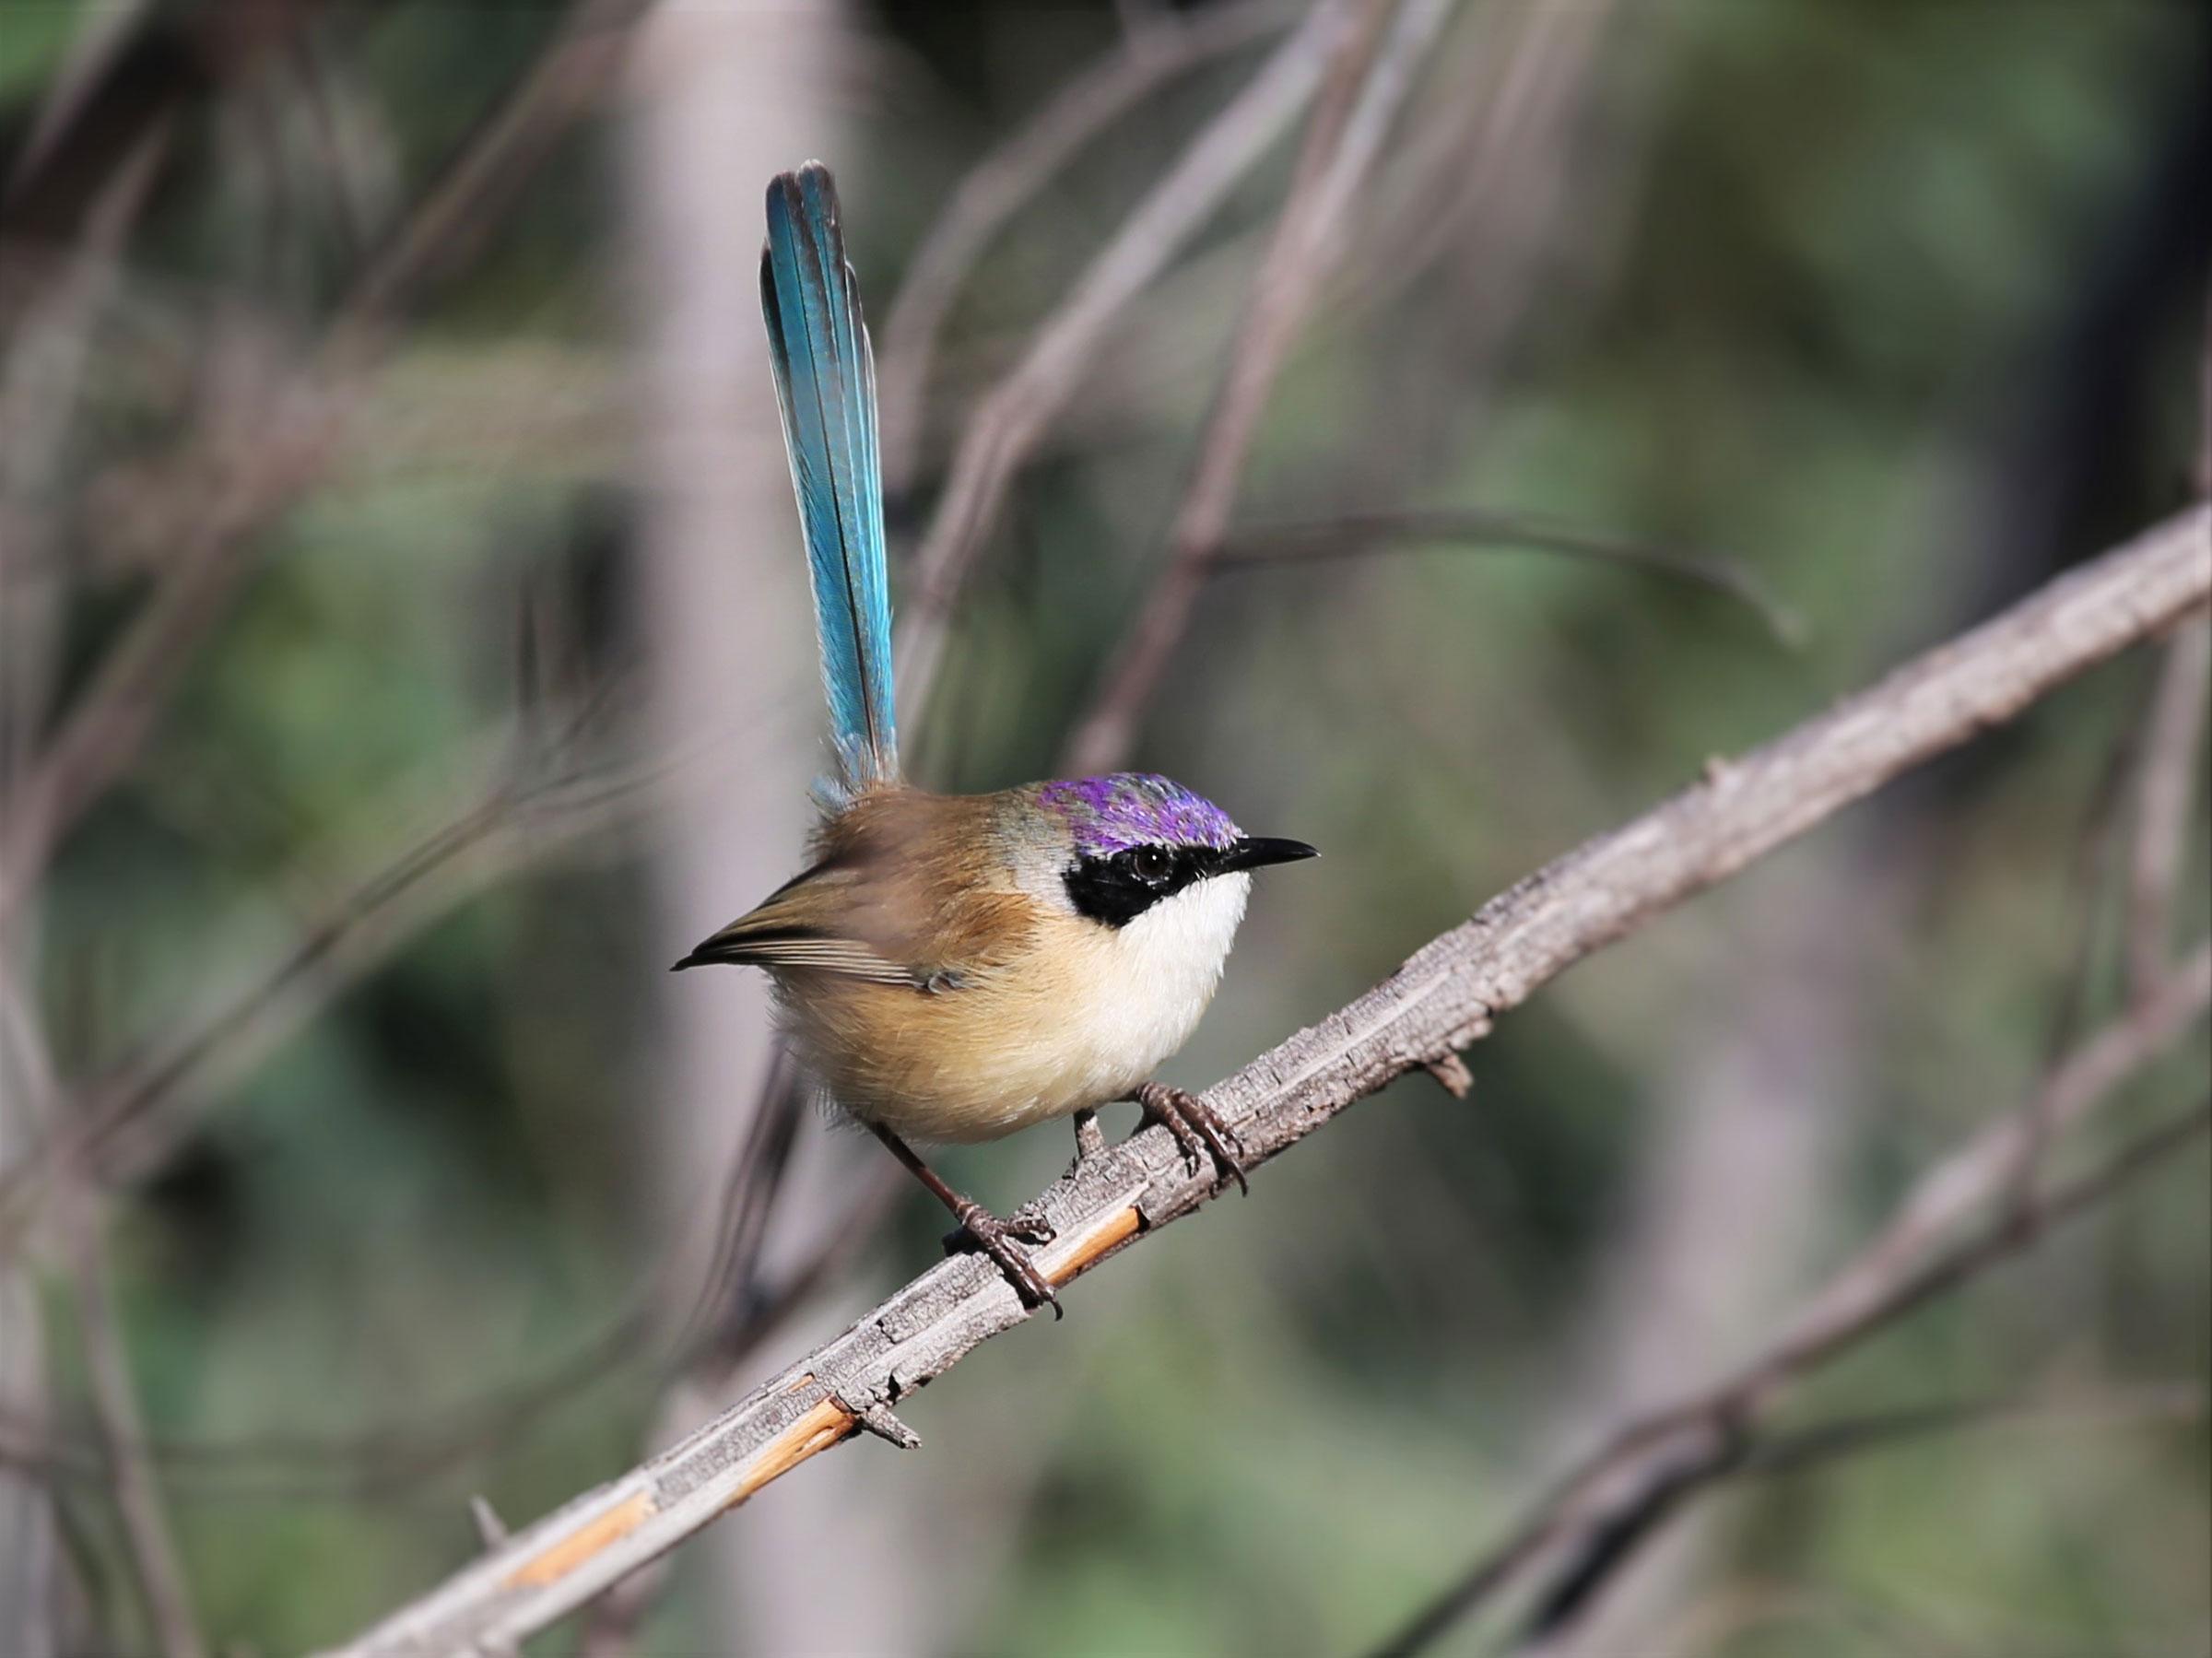 "Purple-crowned Fairy-wren. <a href=""https://www.flickr.com/photos/126953422@N04/28679803251/in/photolist-iQaNq7-iQcNWL-iQcNh9-iQcMEs-KGkujp"">Graham Winterflood</a>/Flickr CC (CC BY-SA 2.0)"